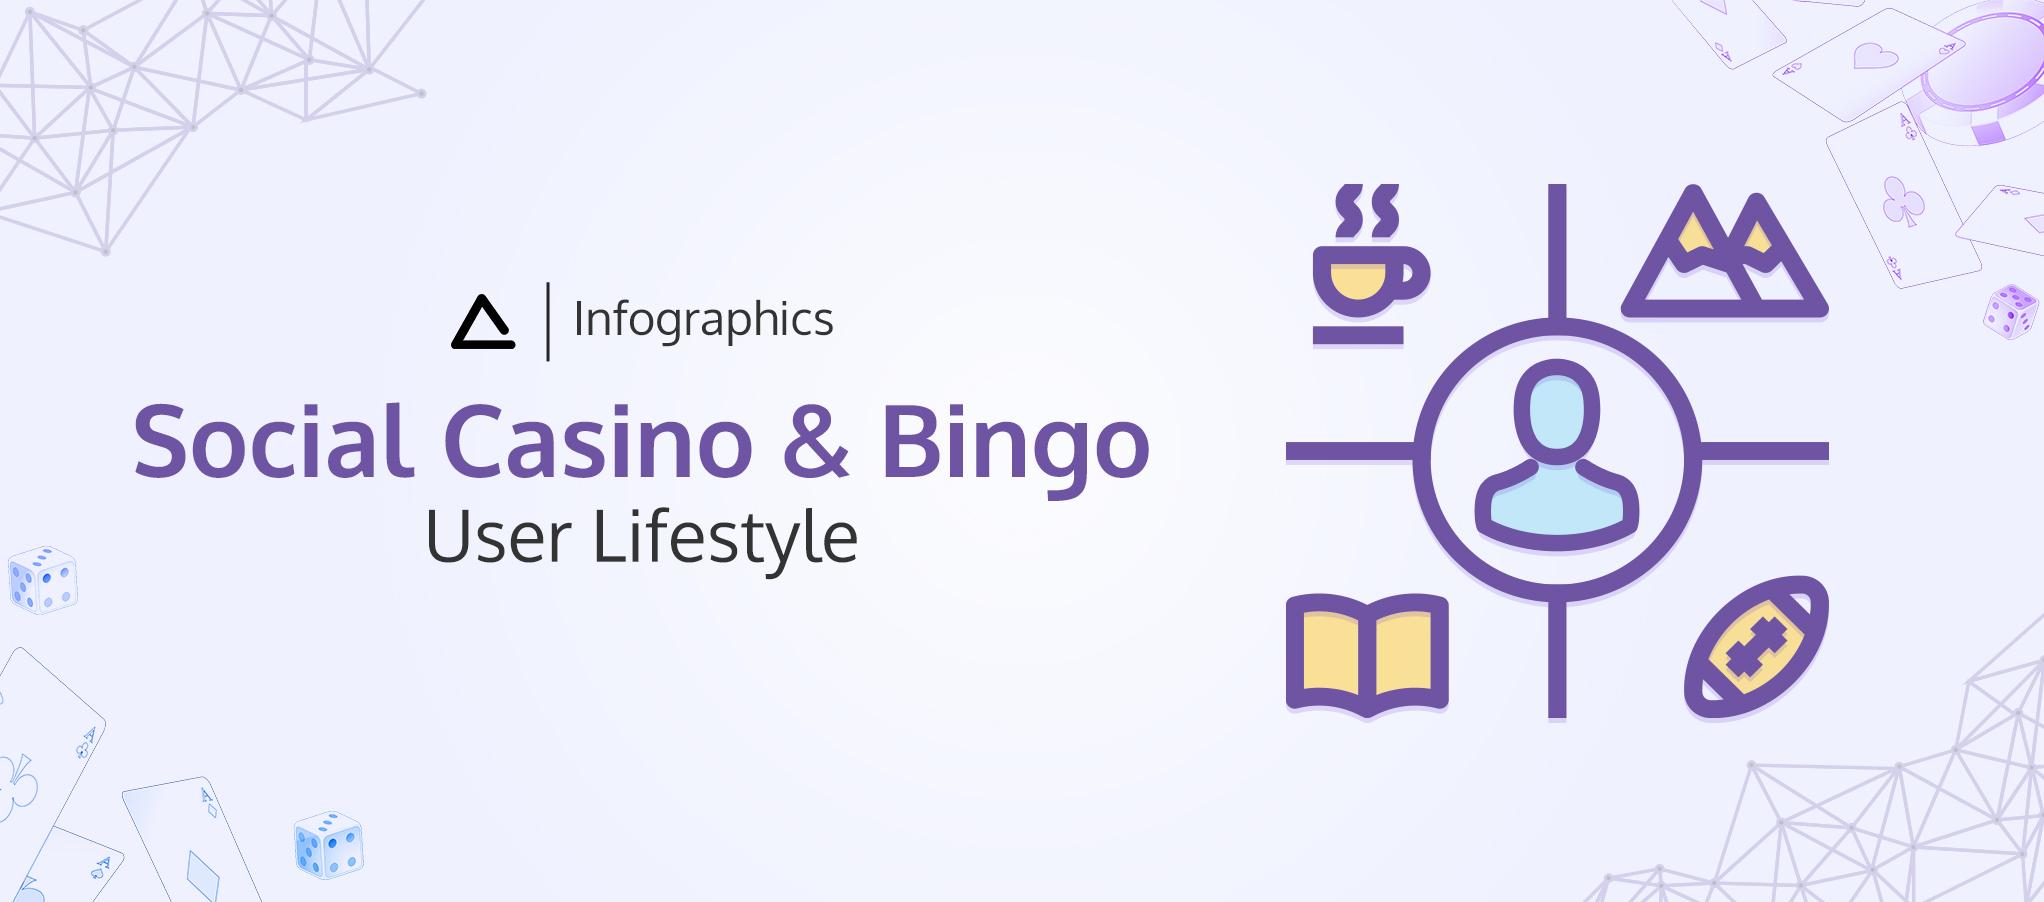 Social casino bingo user lifestyle